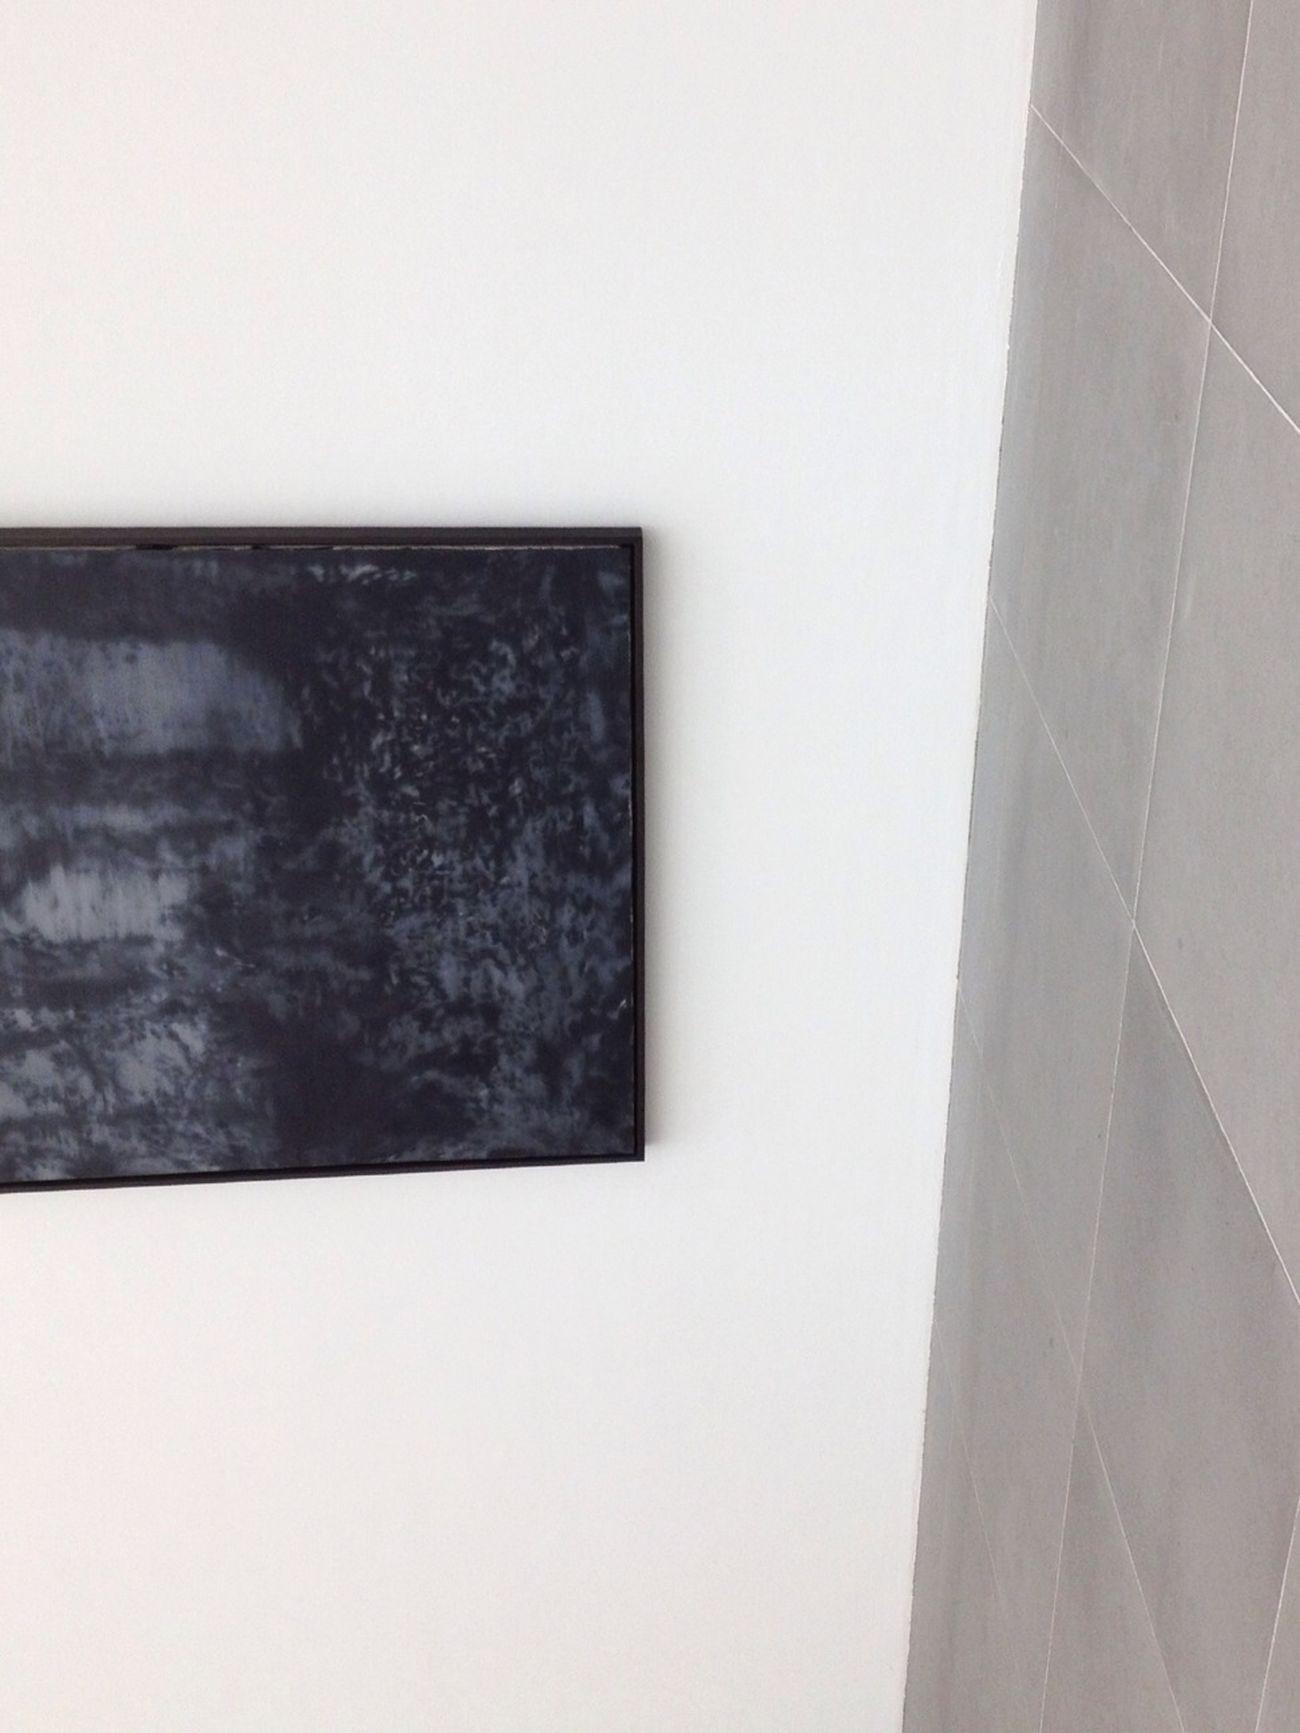 Simplicity Minimalism Changeyourperspective Art